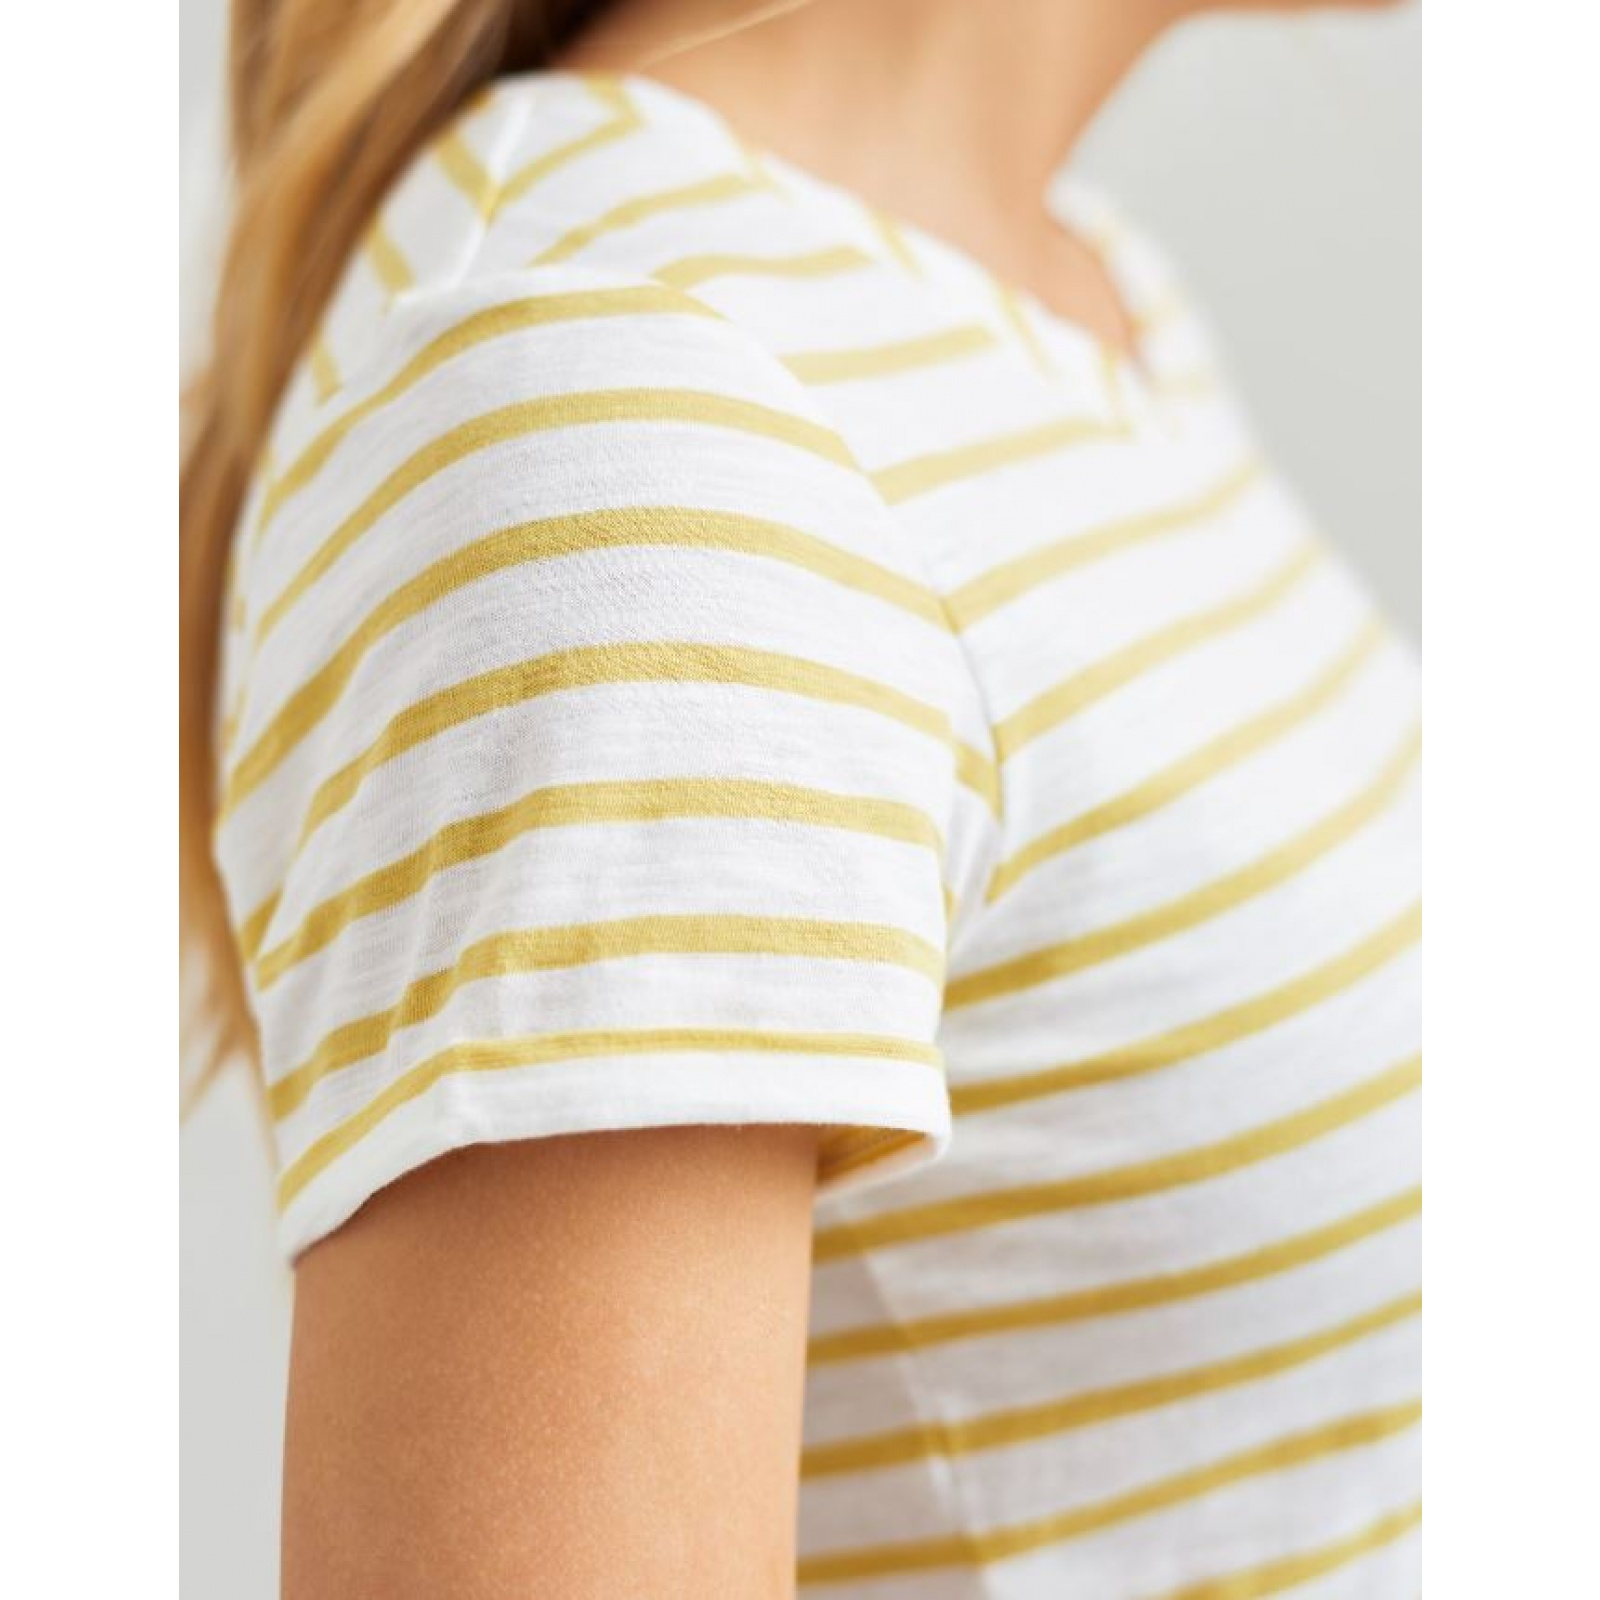 Joules-Nessa-Raya-Ligero-Jersey-Camiseta-SS19 miniatura 30